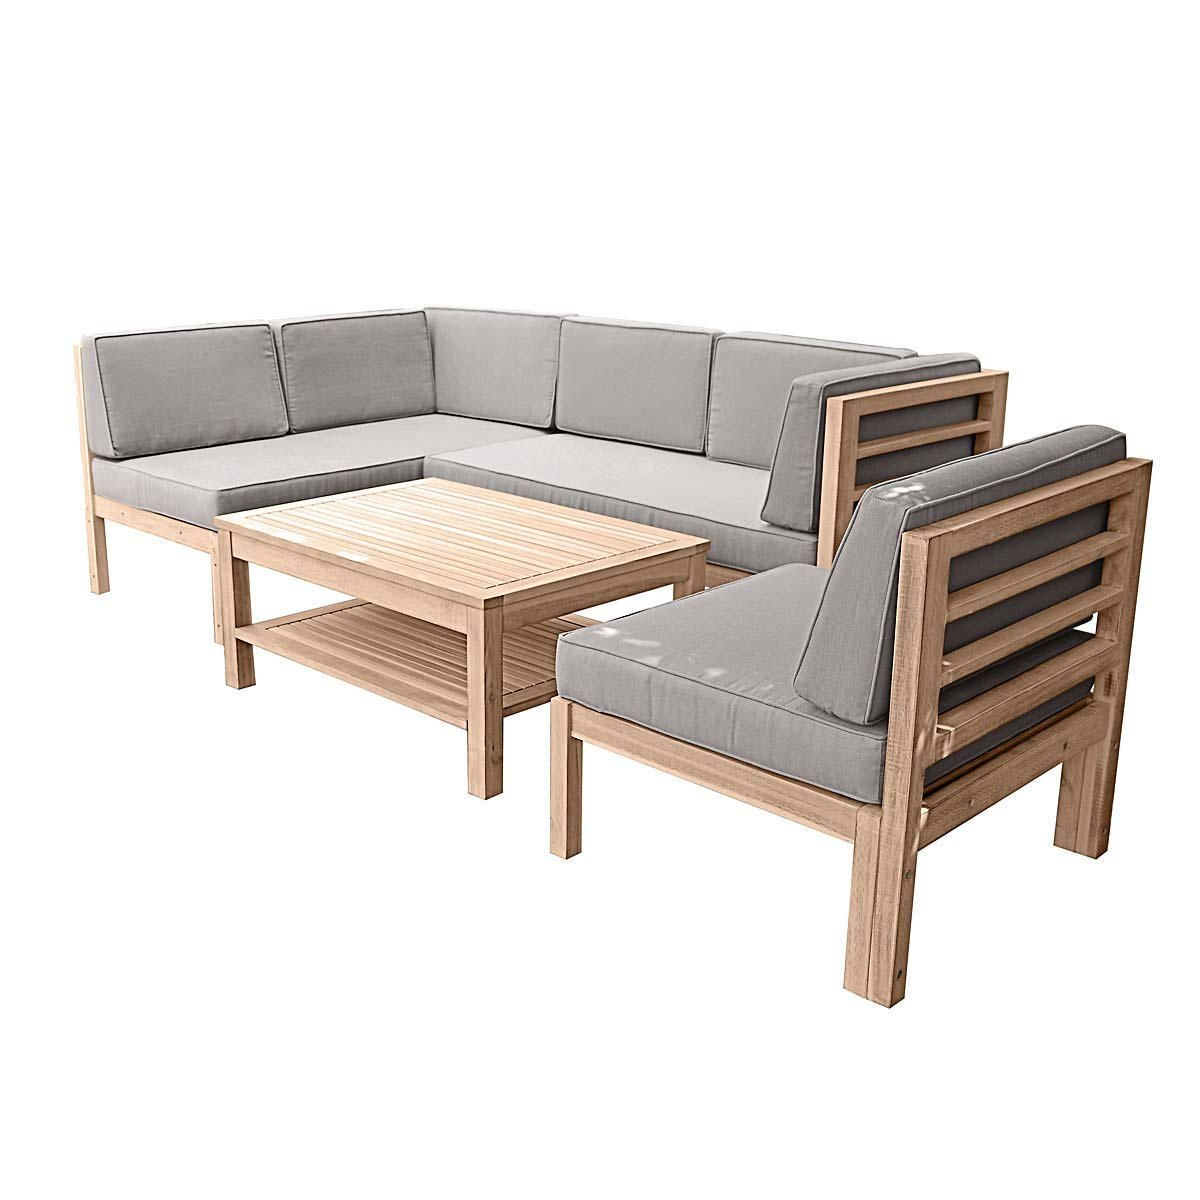 Balkonmobel Set Holz Gartenmobel Set Aus Holz Galerie Kwozalla